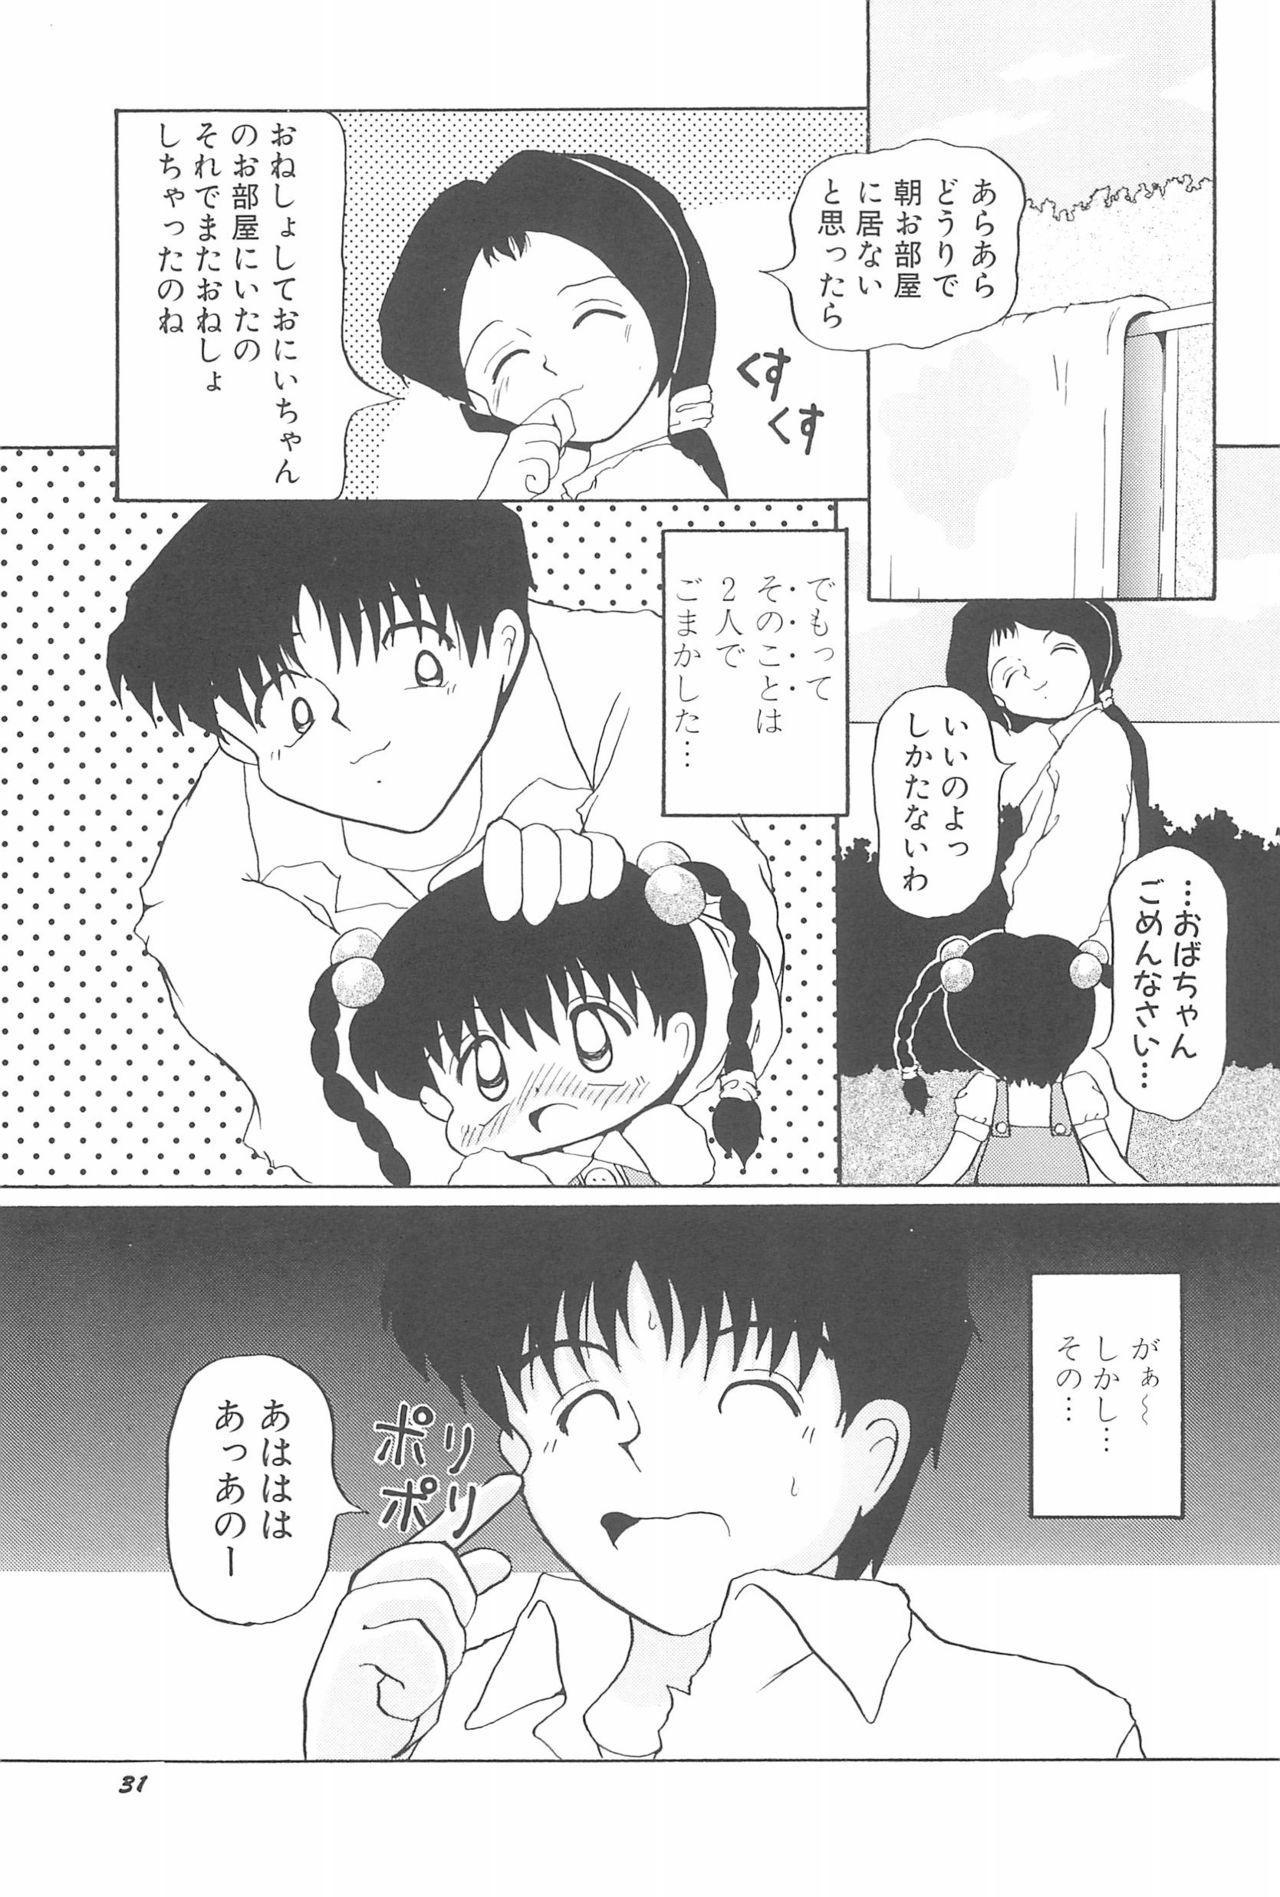 Aoi Shojokyuu 36